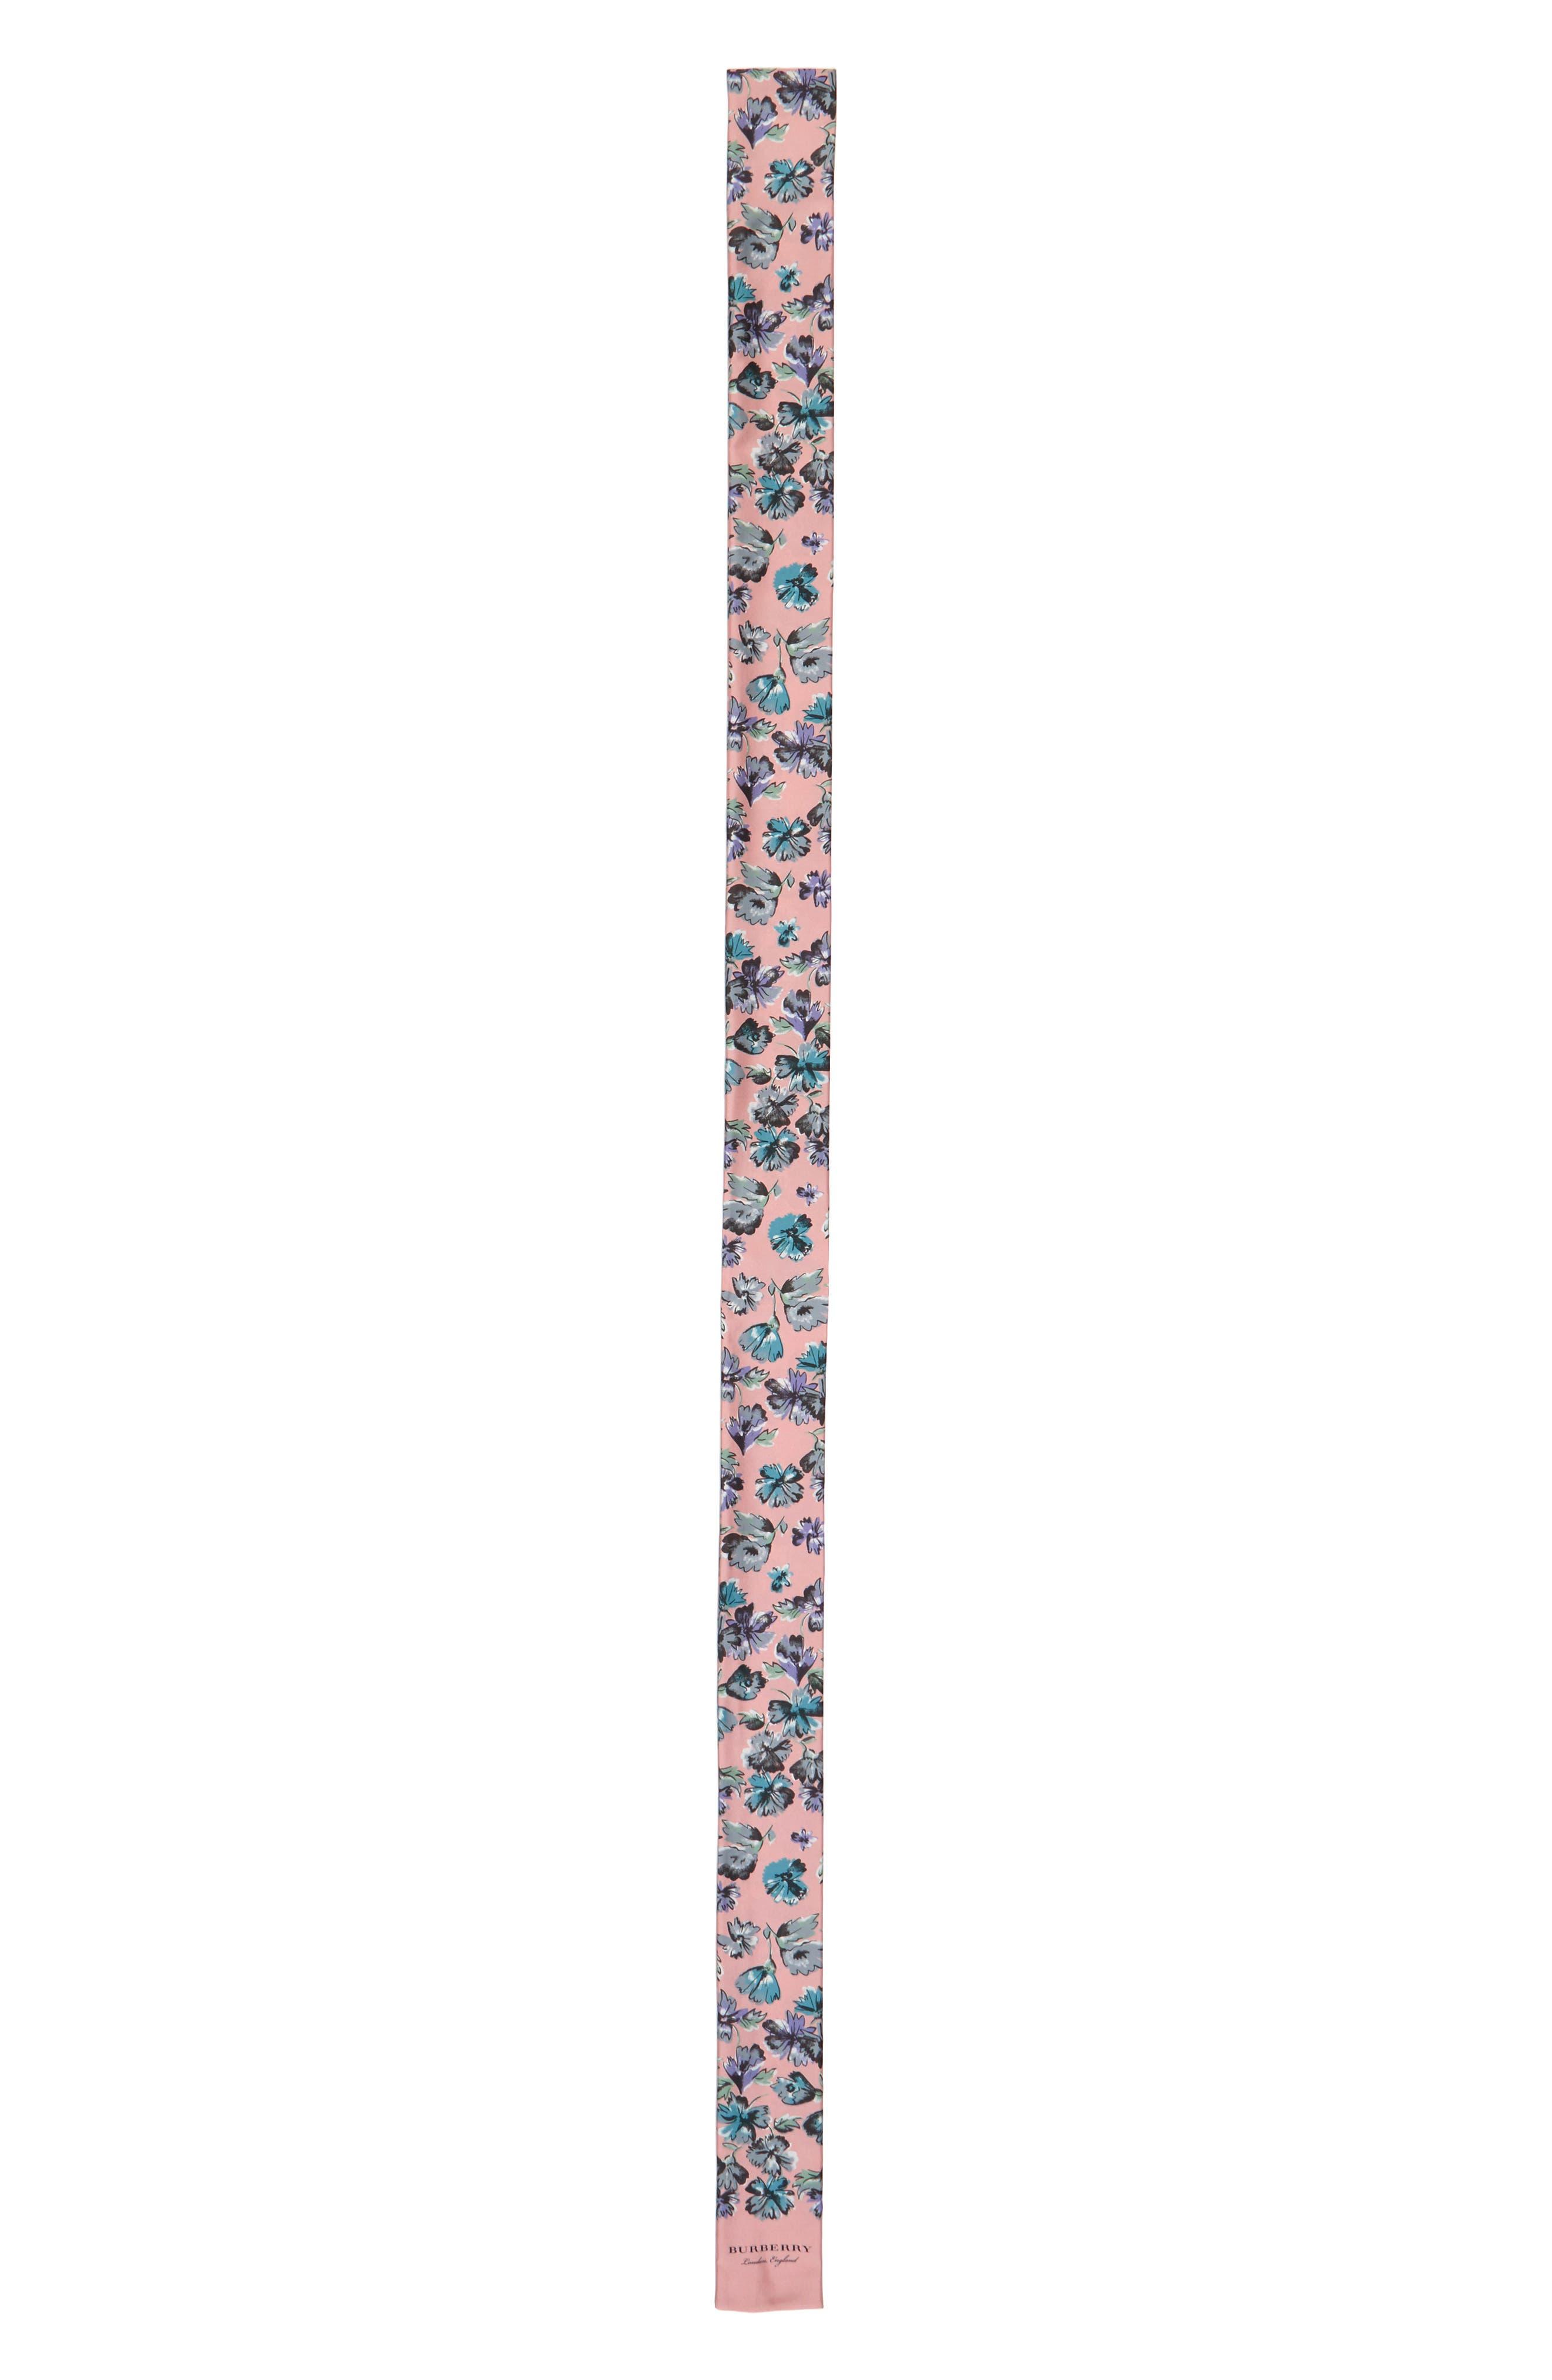 Scatter Floral Silk Skinny Scarf,                             Alternate thumbnail 2, color,                             Rose Pink